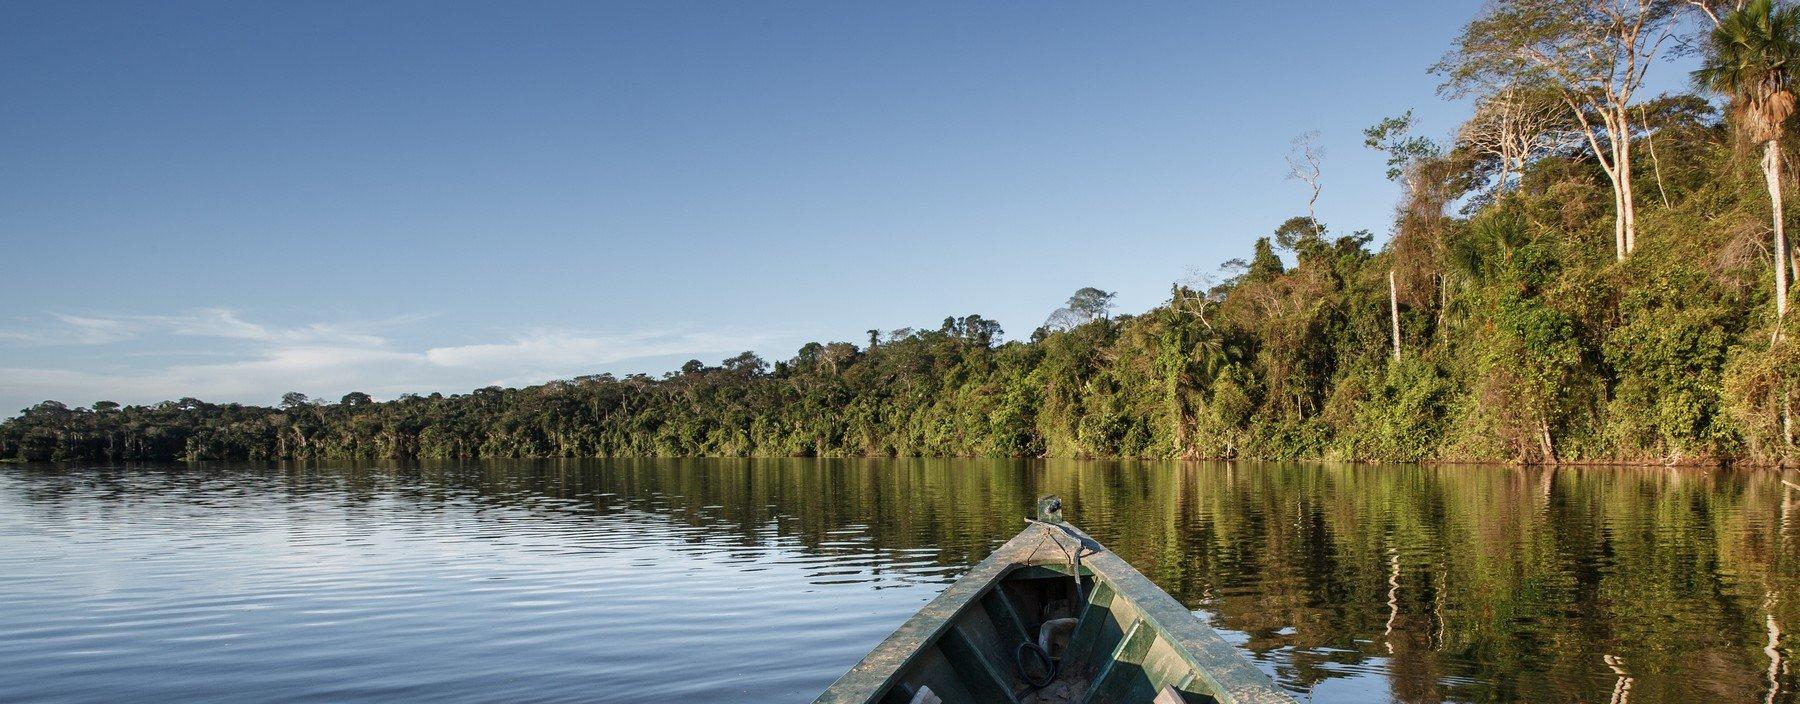 pe, iquitos, amazone regenwoud (6).jpg